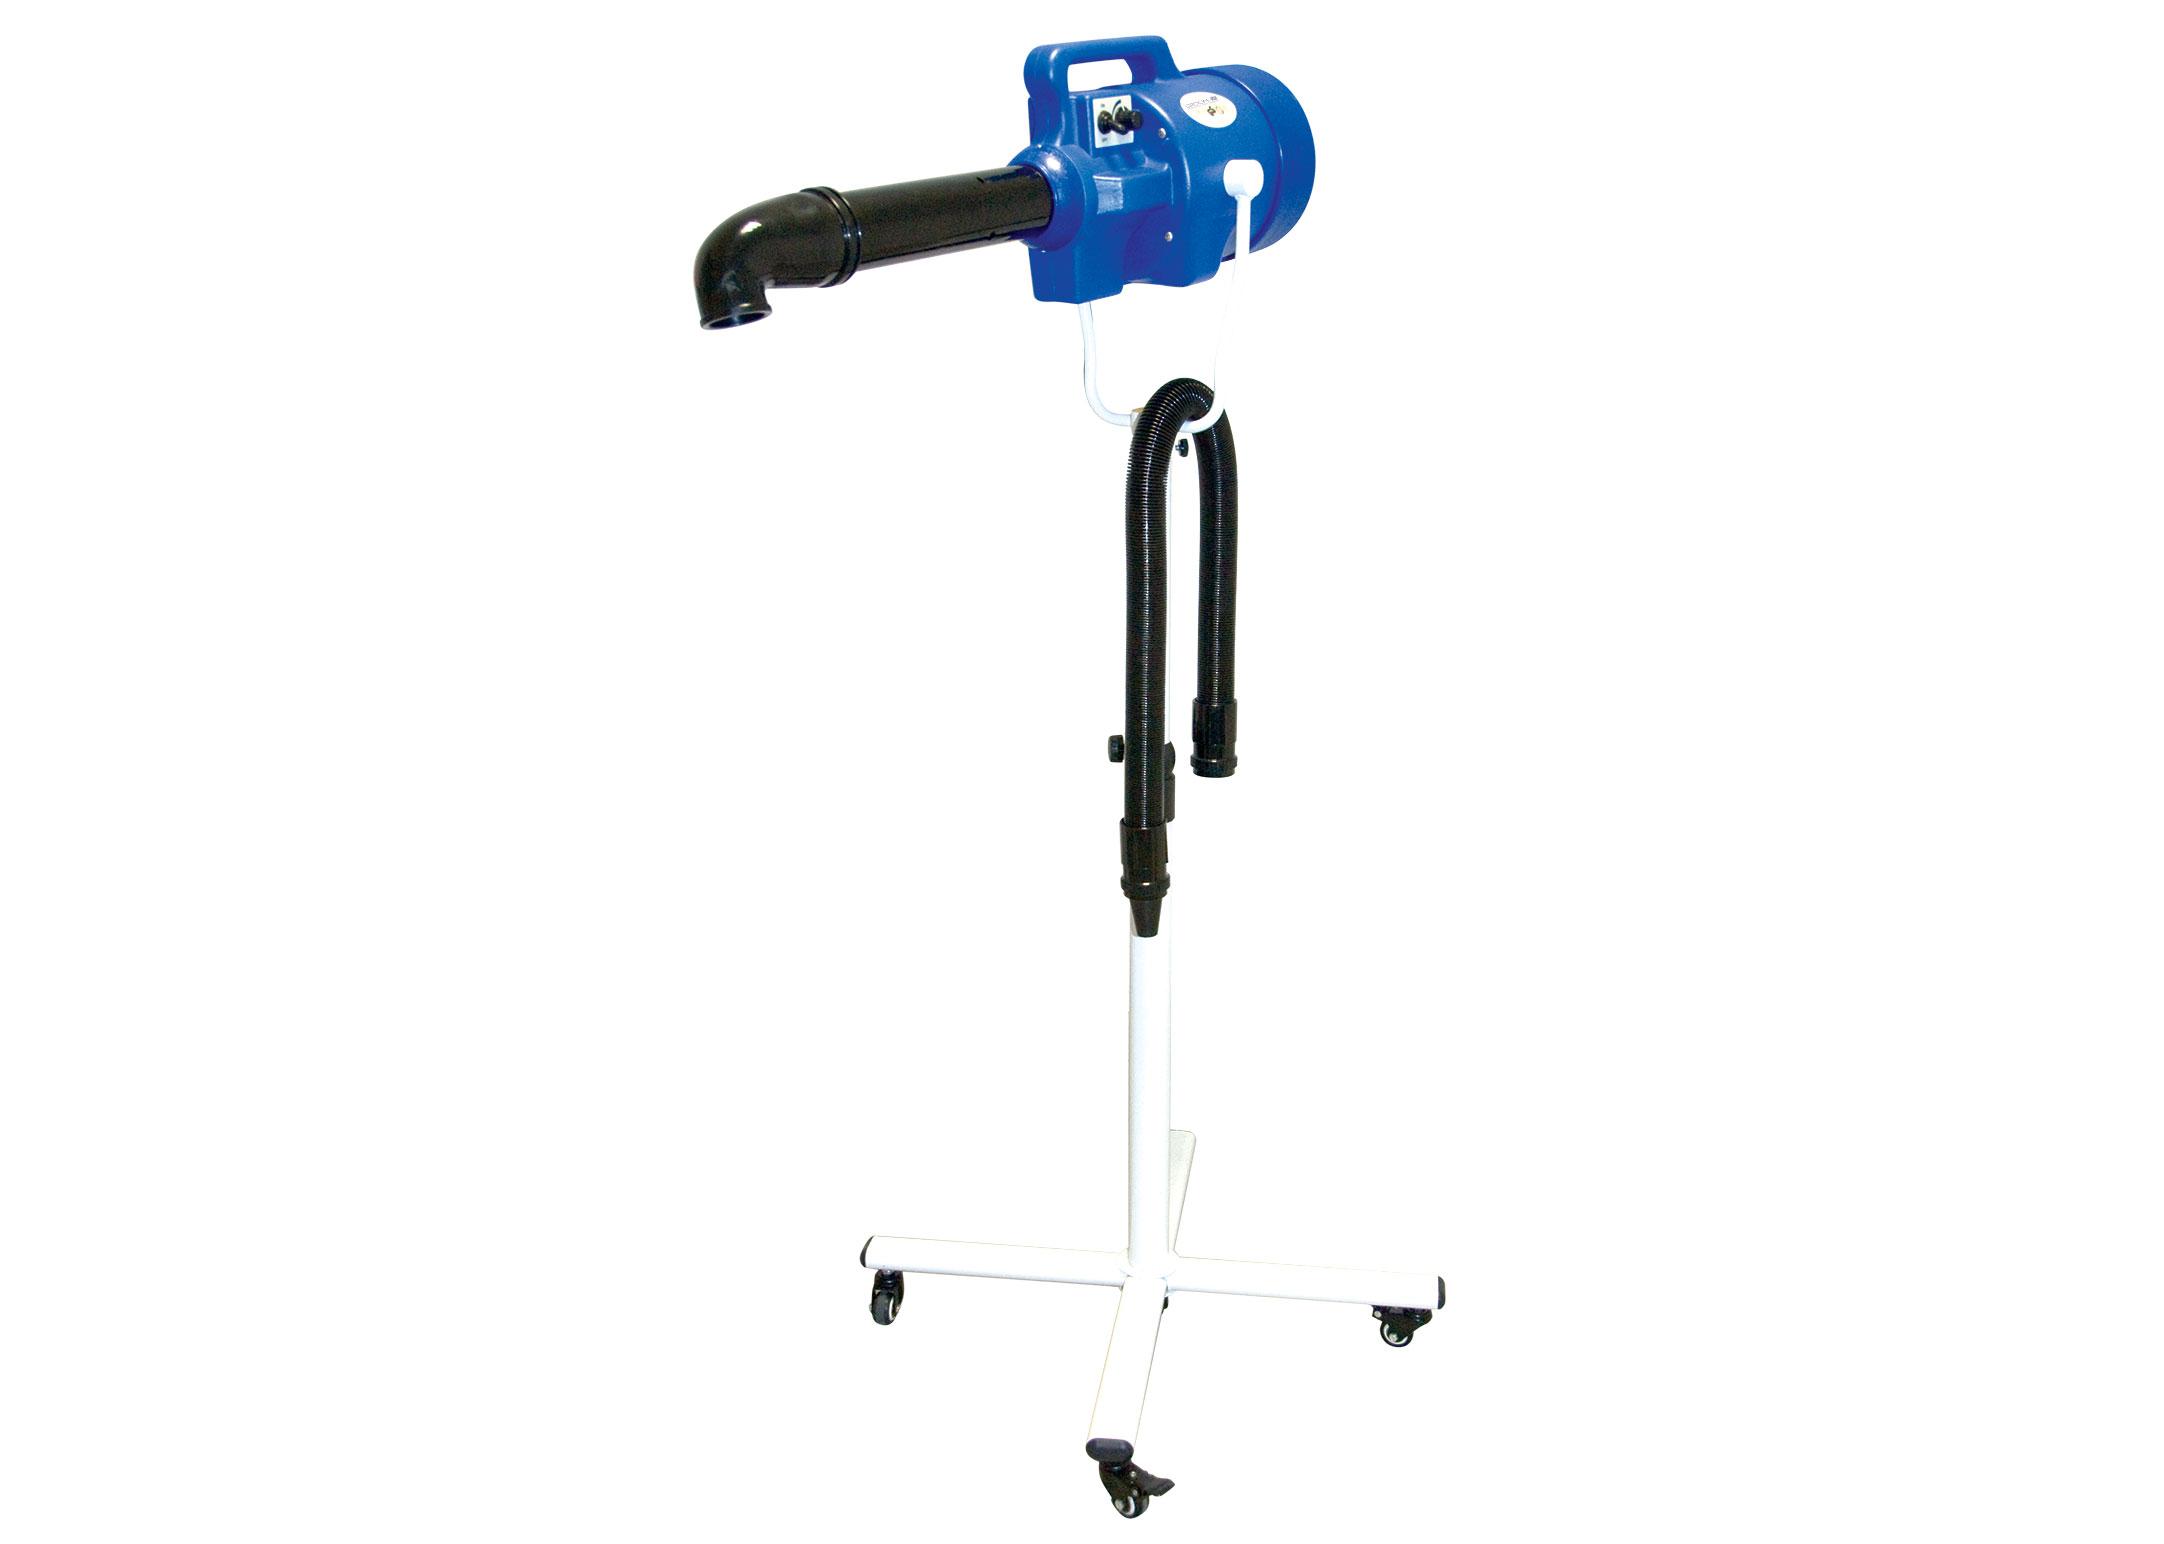 Groom-X Combi Stand Dryer Blue Hair Dryer